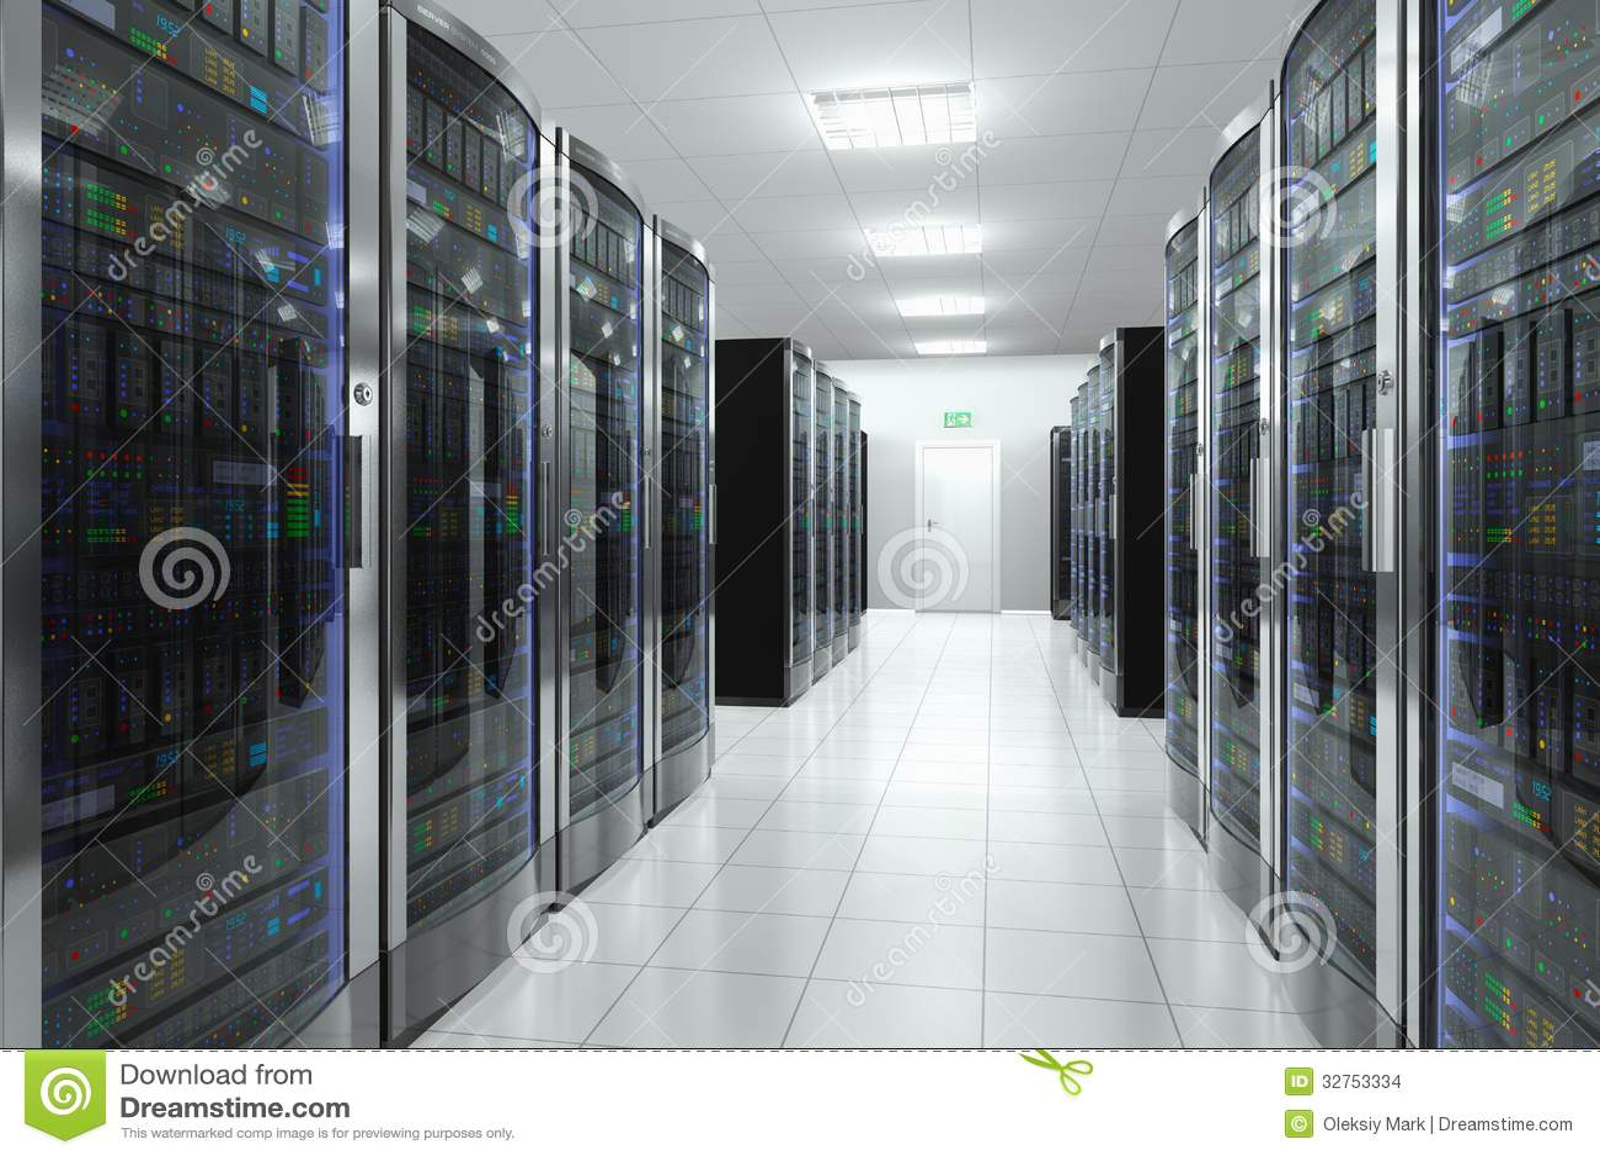 server room in datacenter stock illustration illustration of